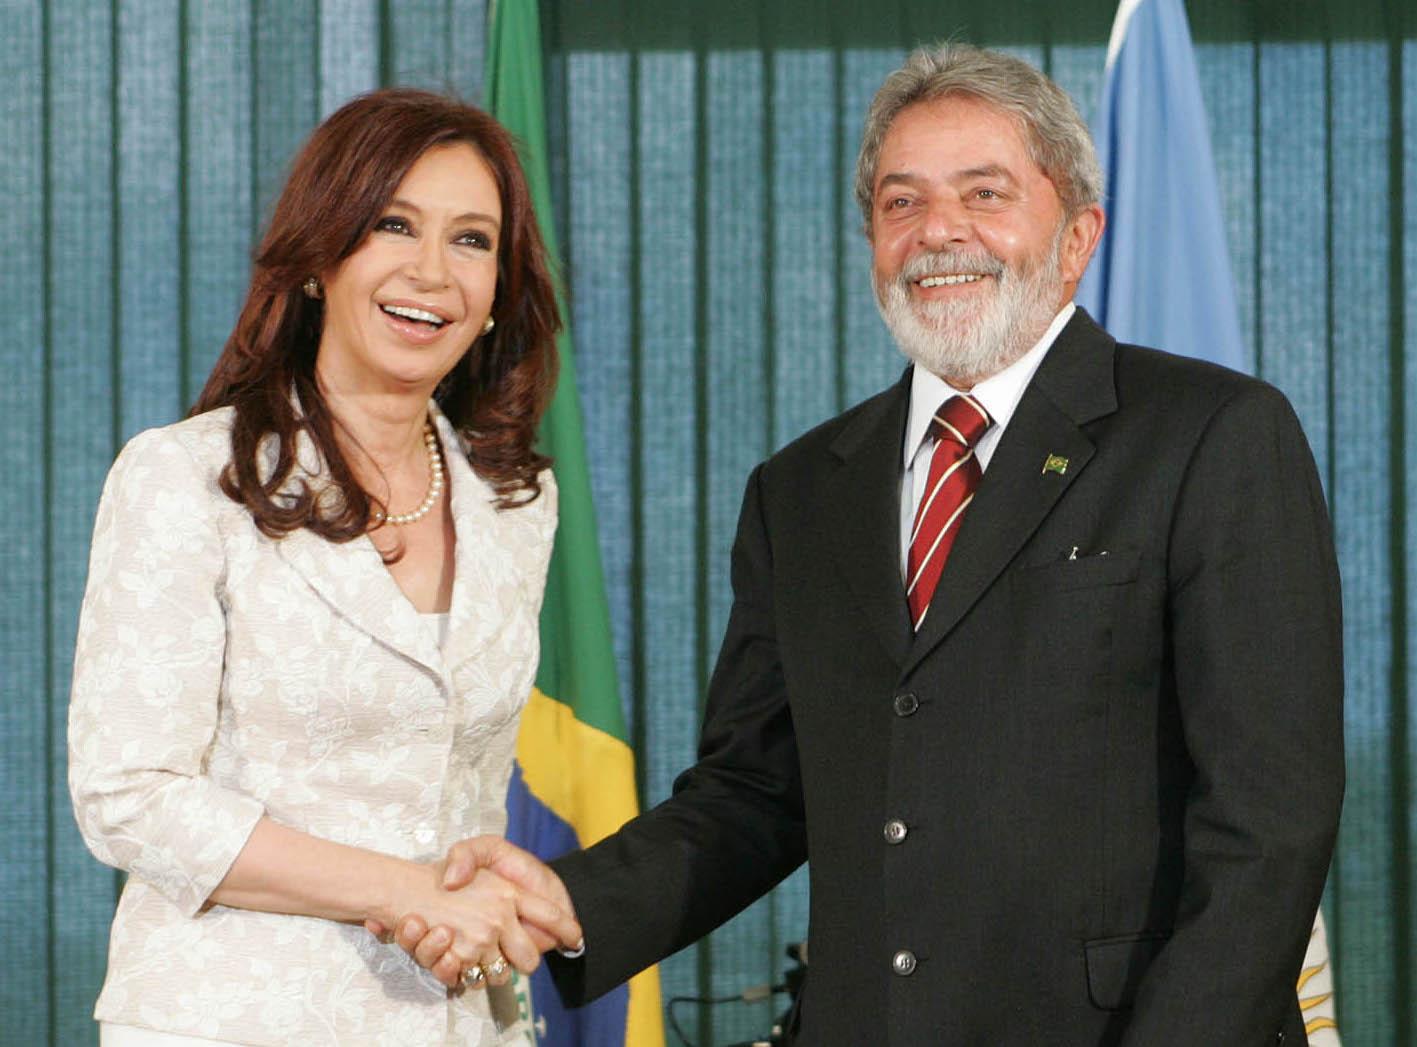 Former President Cristina Fernández de Kirchner of Argentina and former President Lula of Brazil